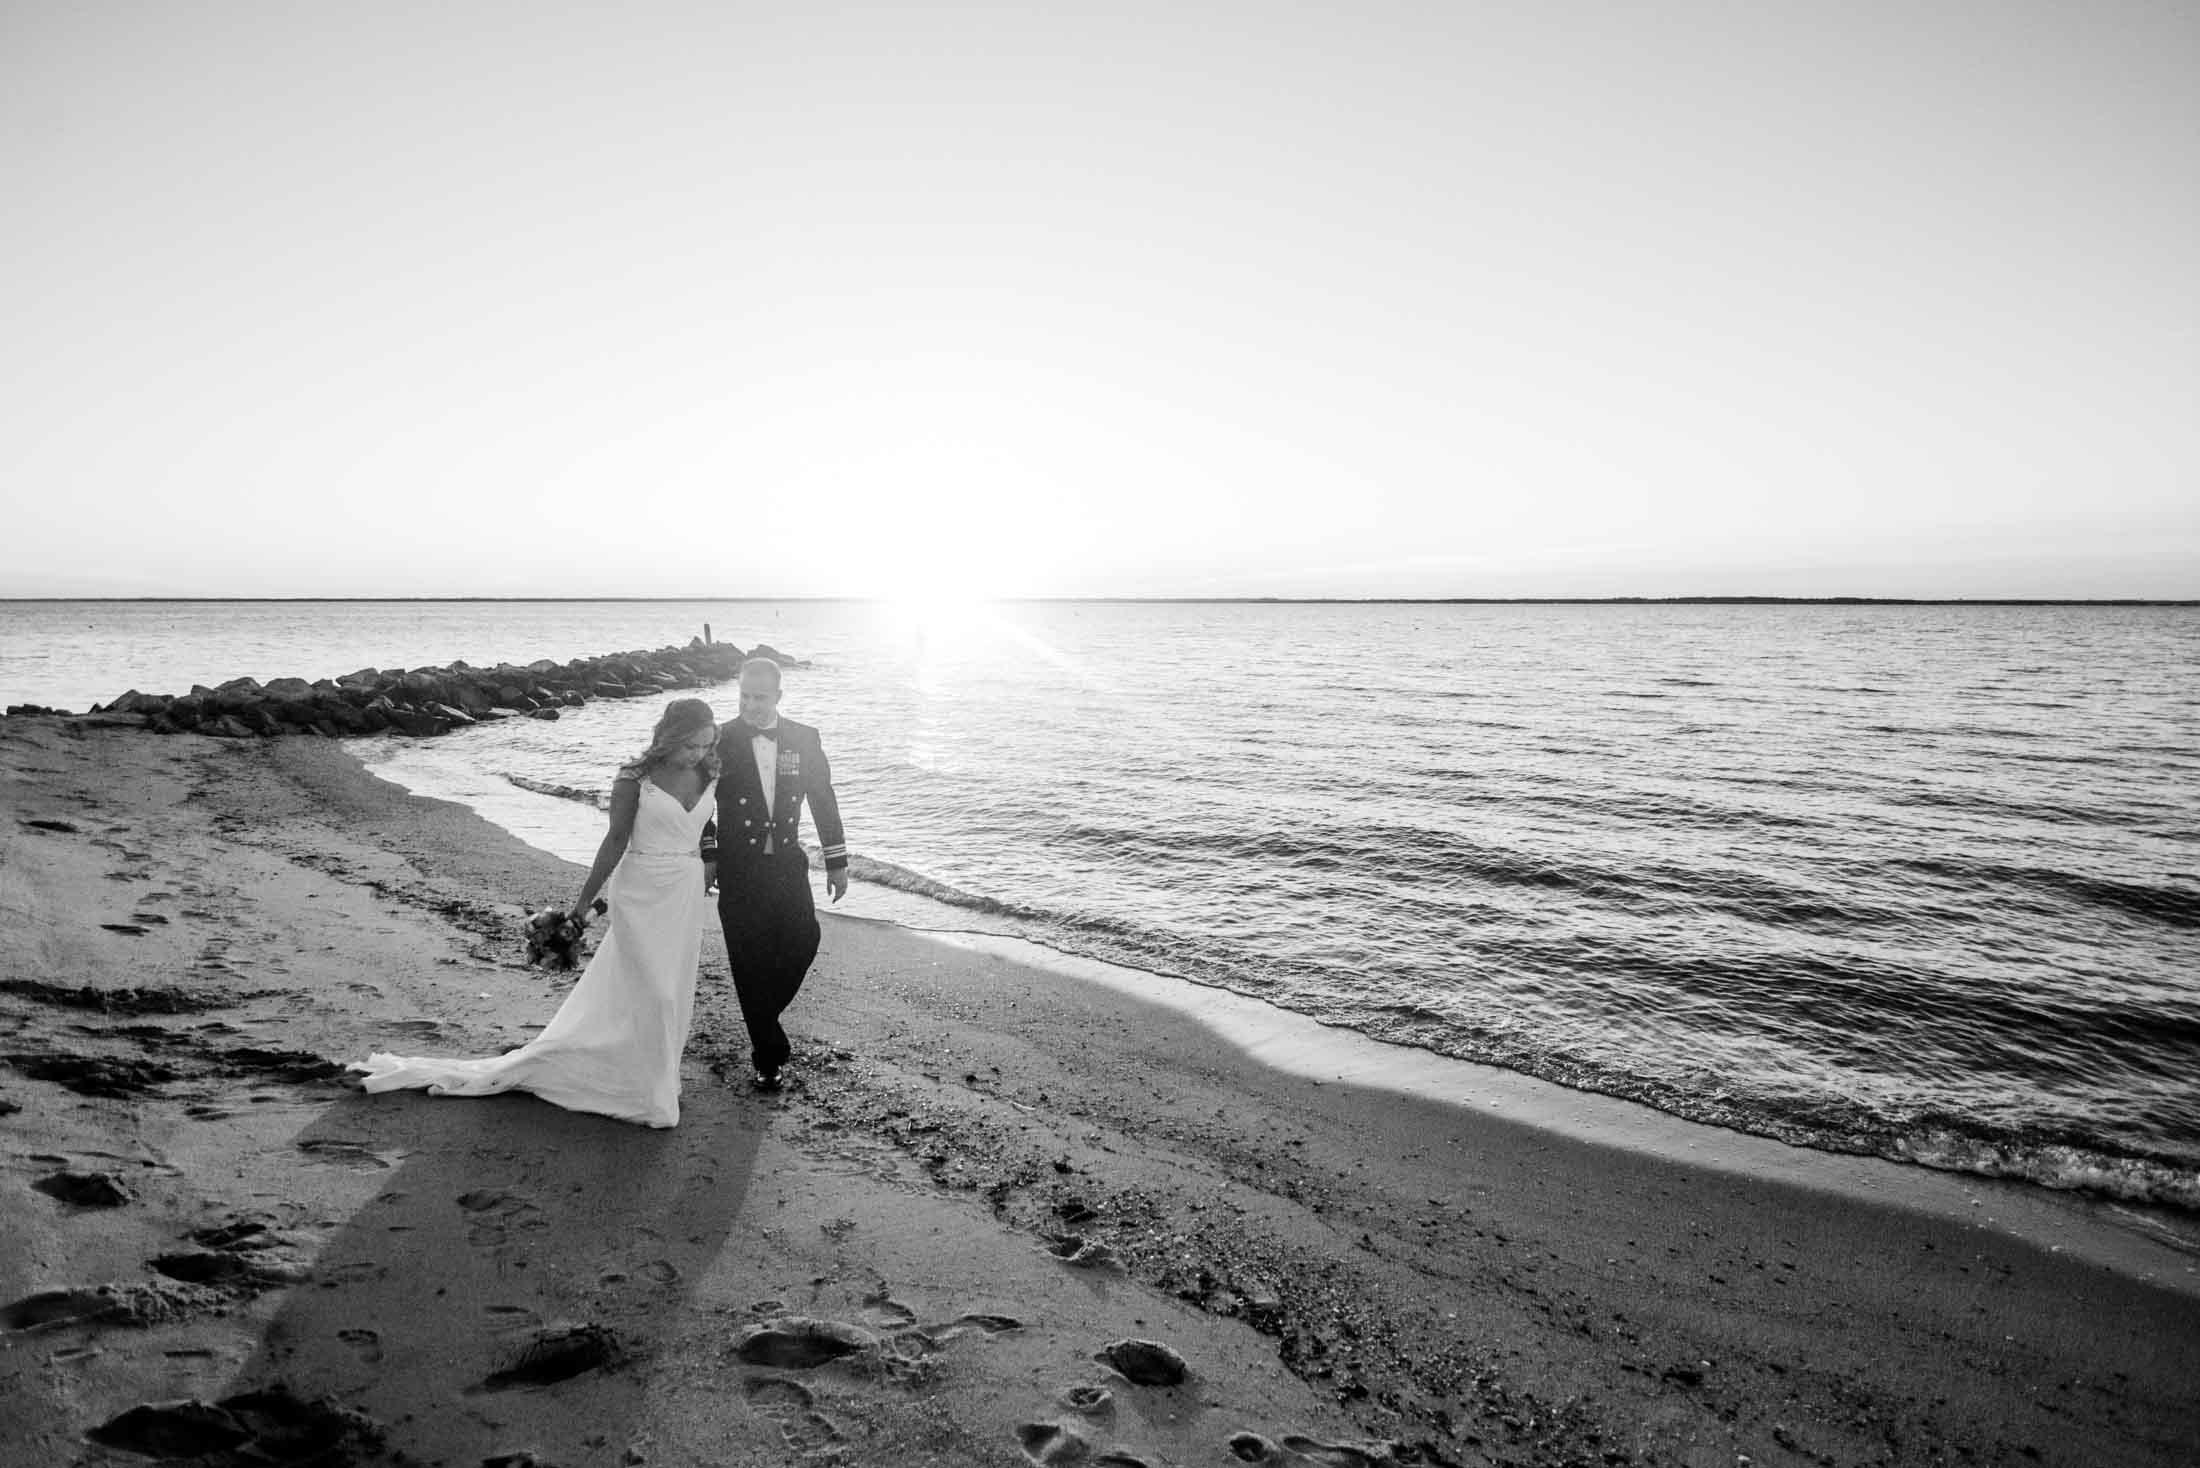 dc+metro+wedding+photographer+vadym+guliuk+photography+wedding+bride+and+groom-2033.jpg